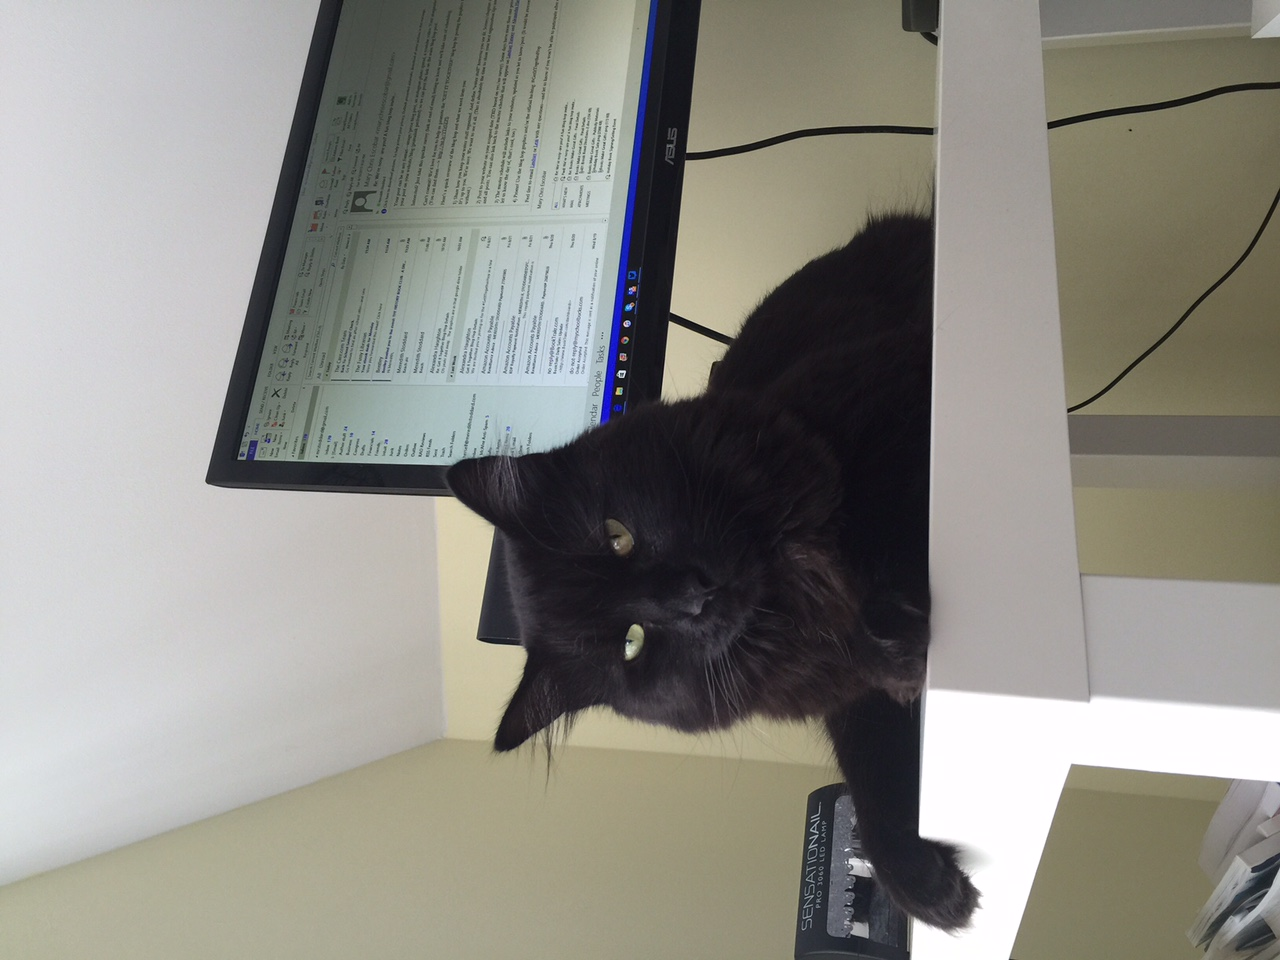 Hemingway enjoying his new desktop digs.